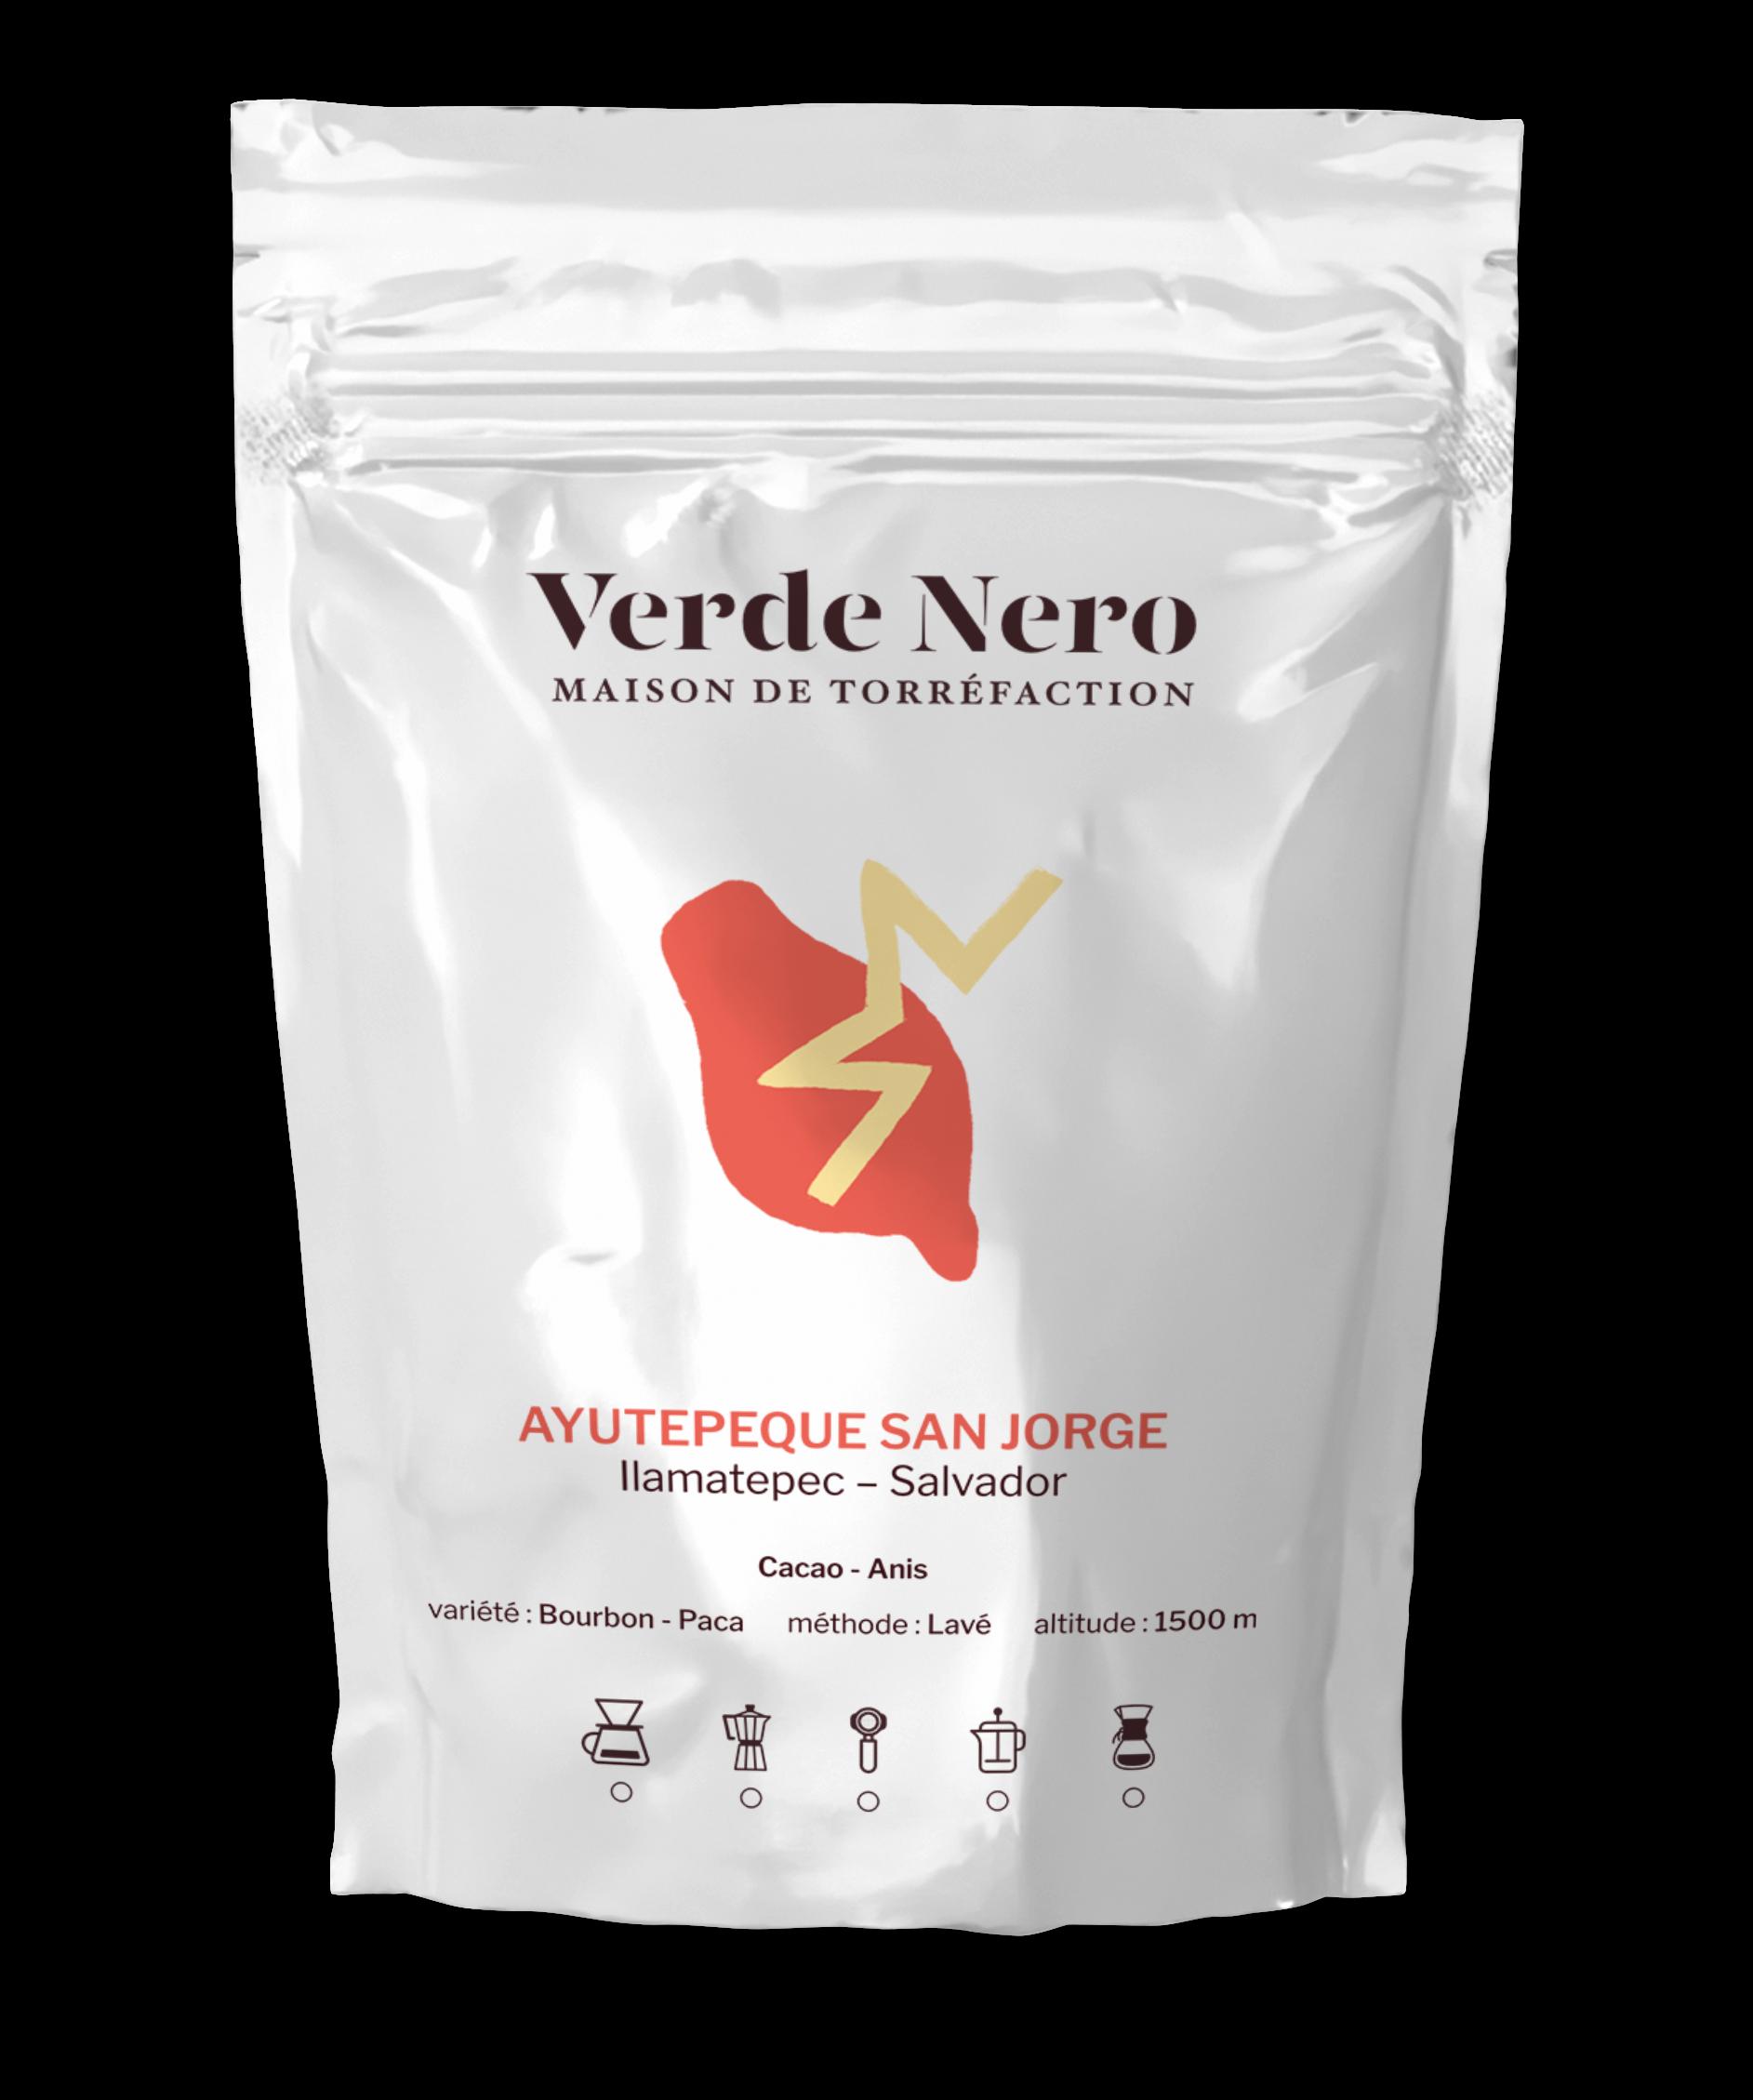 Verde Nero - Ayutepeque San Jorge